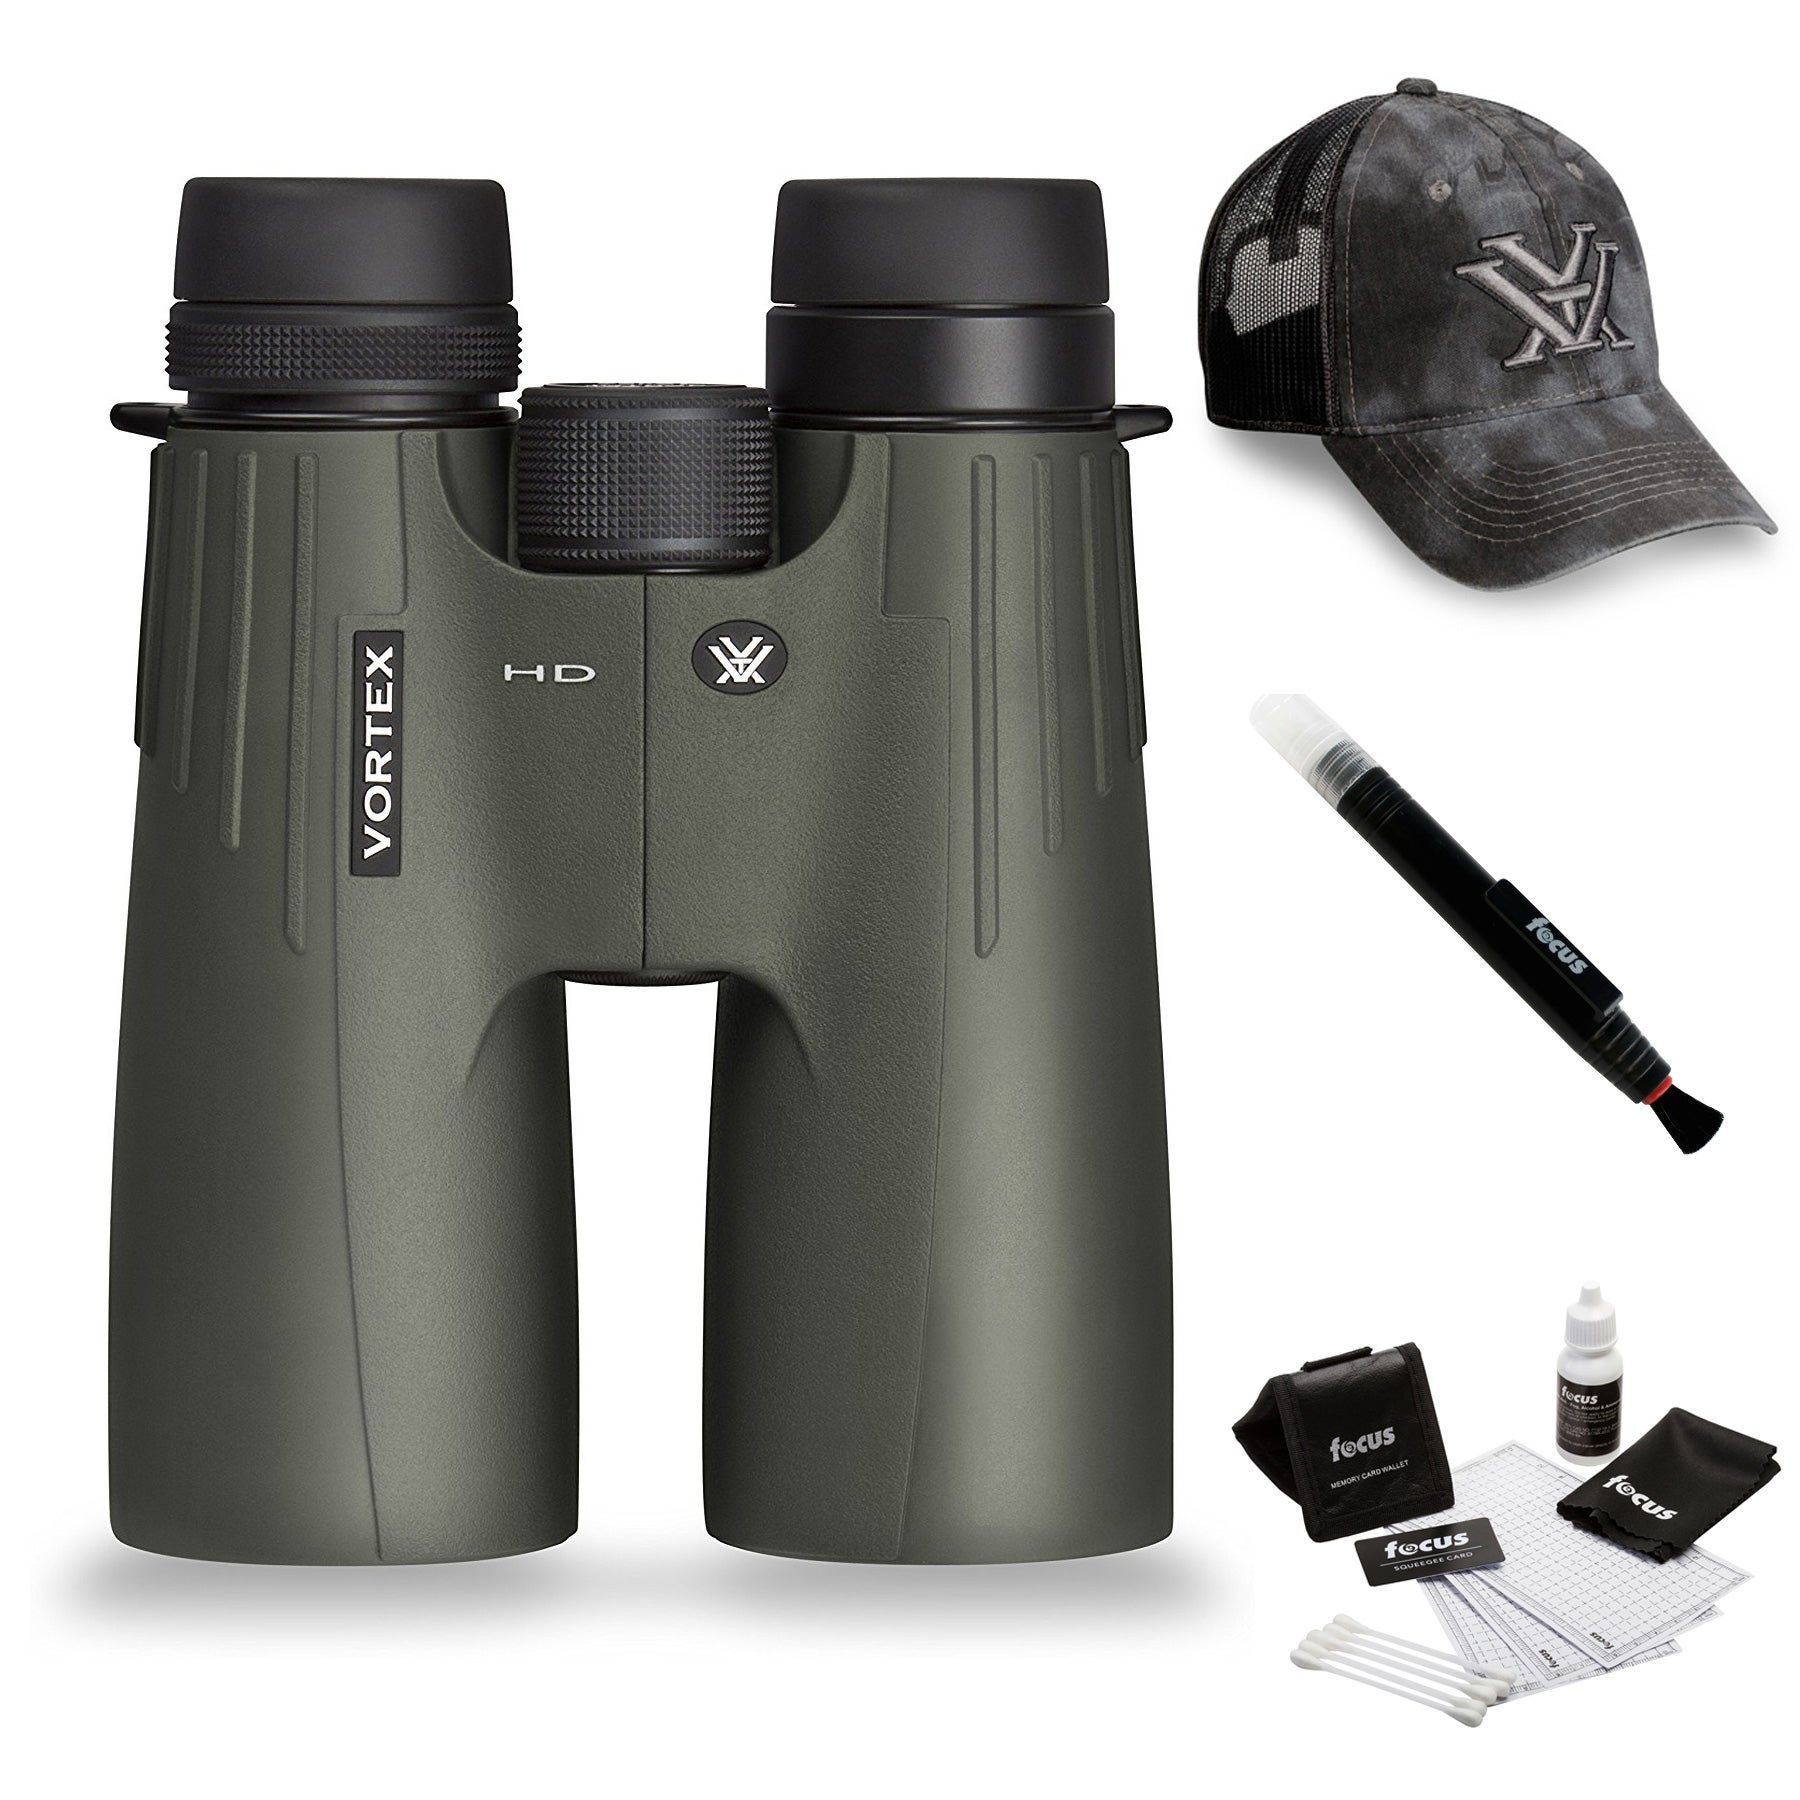 Shop Vortex 15x50 Viper HD Binocular + Foam Float Strap + Accessory Kit -  Free Shipping Today - Overstock.com - 16147255